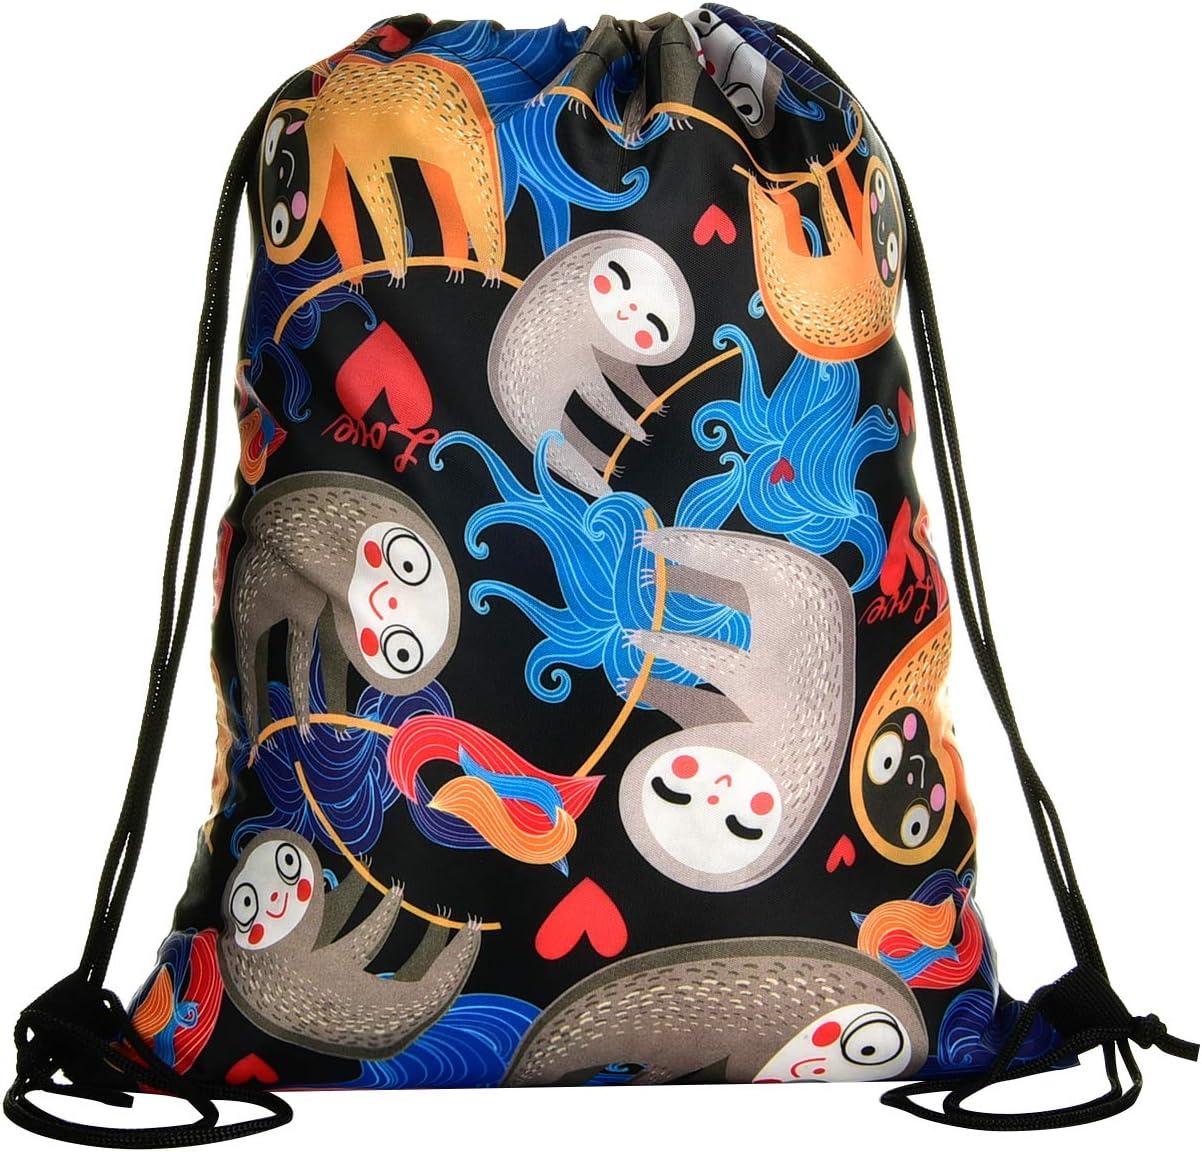 LIHI BAG Kids10 Pack Party Supplies Favors Gift Drawstring Backpack Dinosaur